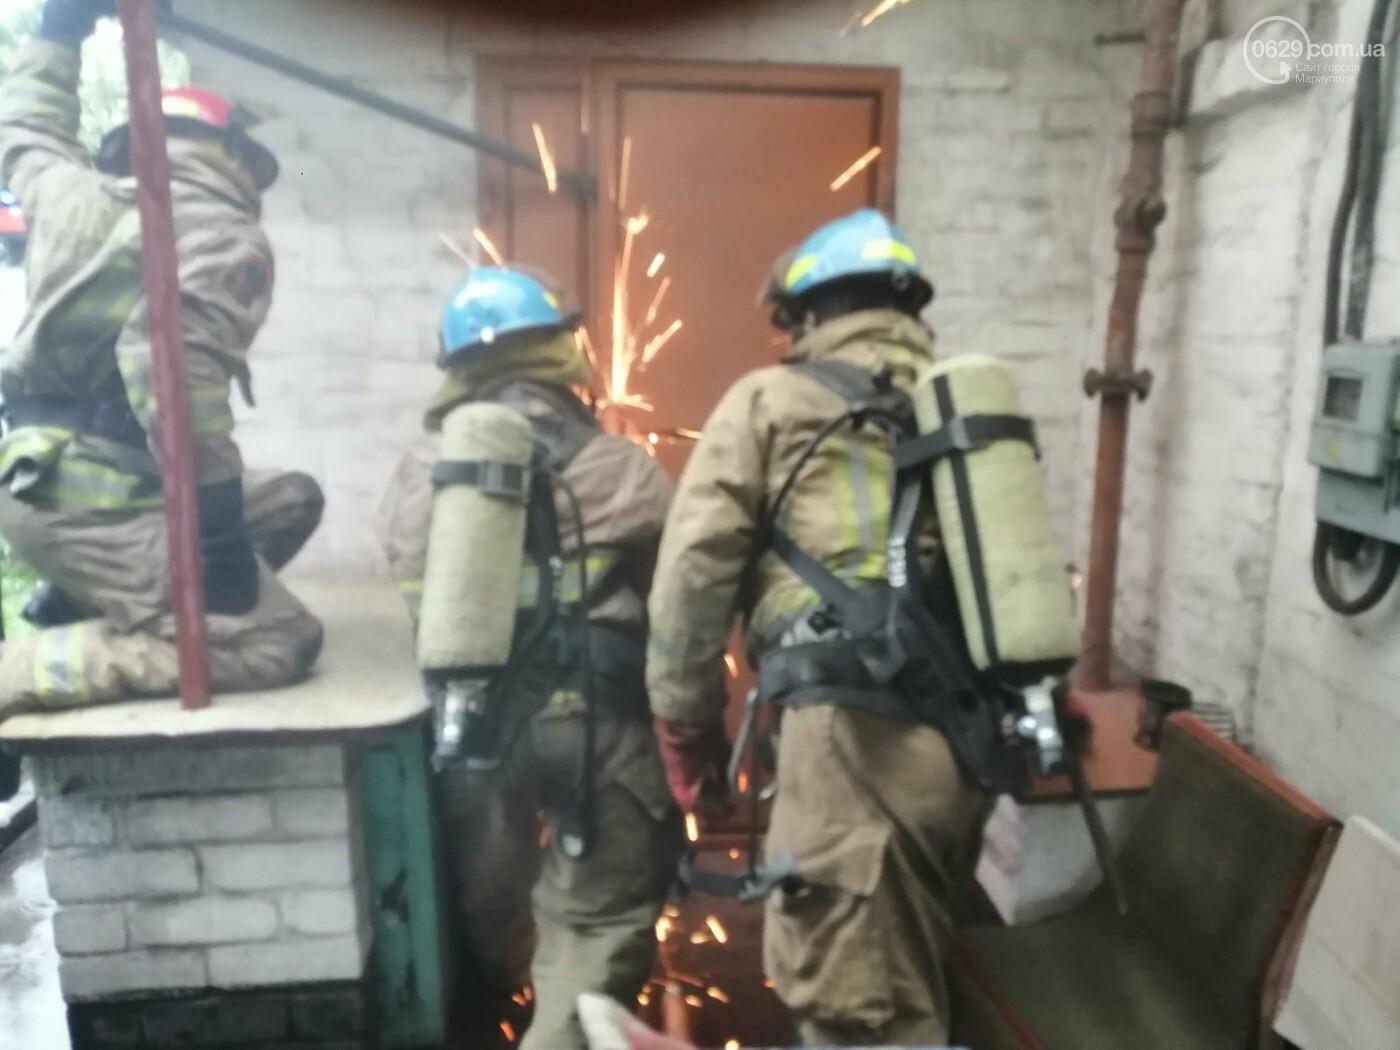 В Мариуполе при пожаре погиб пенсионер, - ФОТО, фото-1